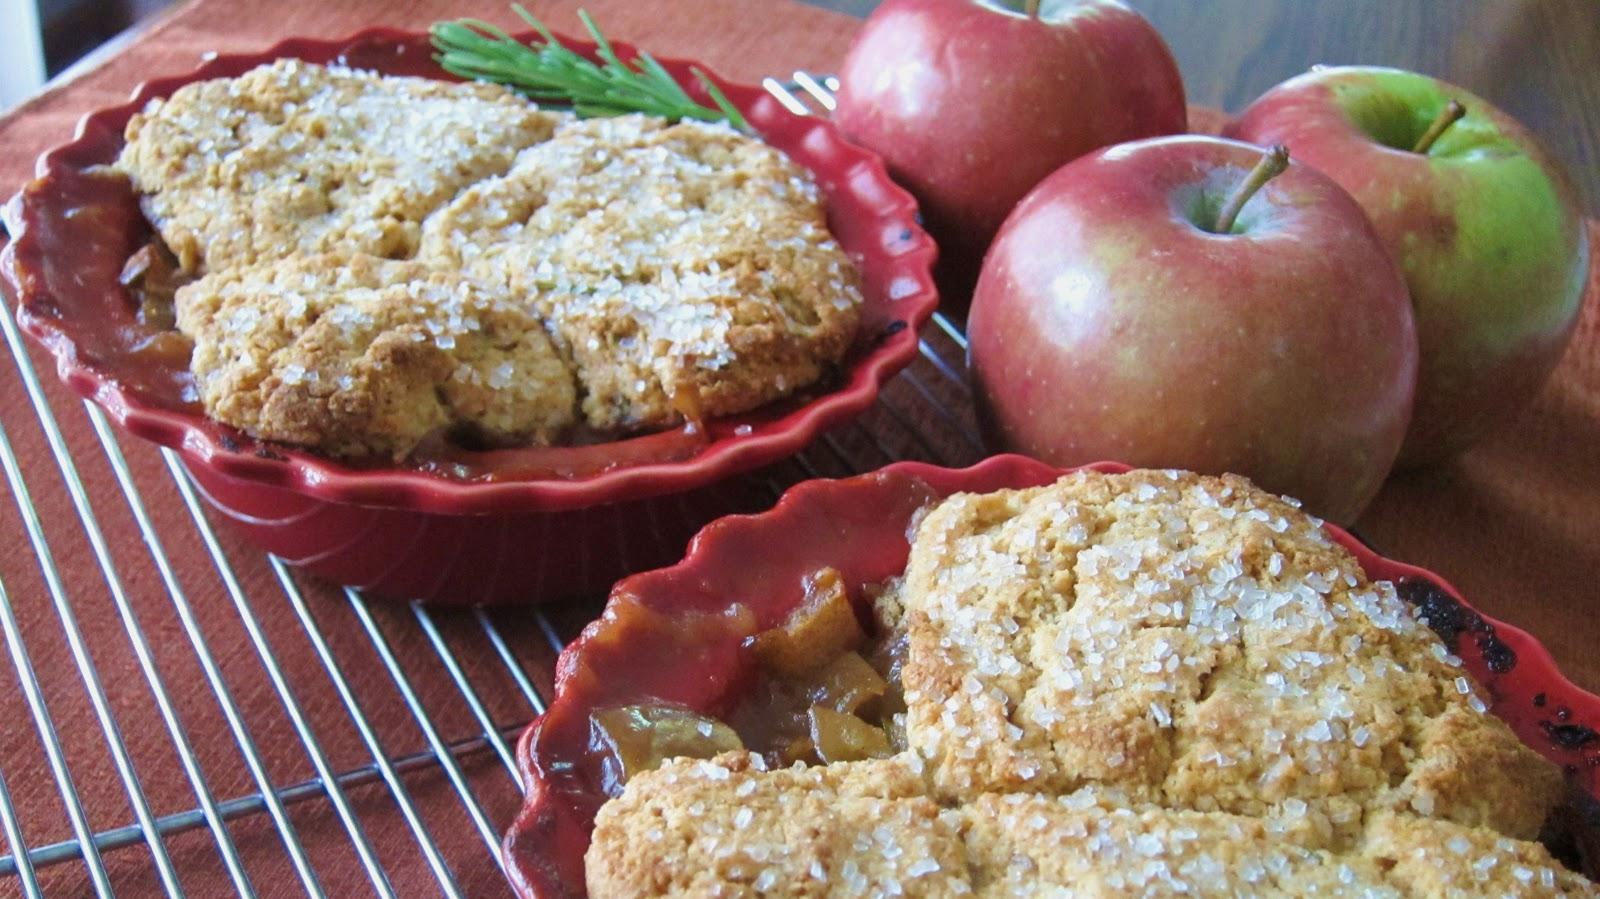 Maple Rosemary Ice Cream Recipes — Dishmaps